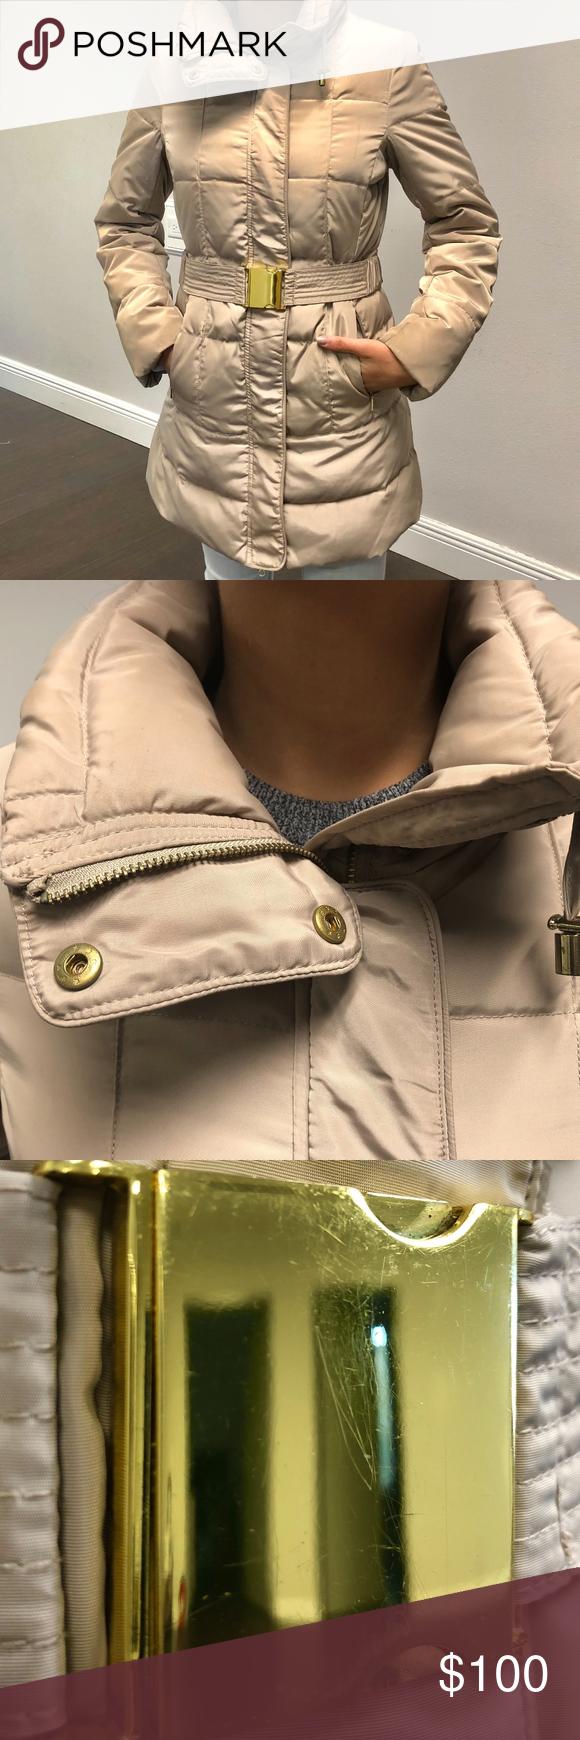 Zara Basic Tan Puffer Jacket Zara Basic Clothes Design Fashion [ 1740 x 580 Pixel ]